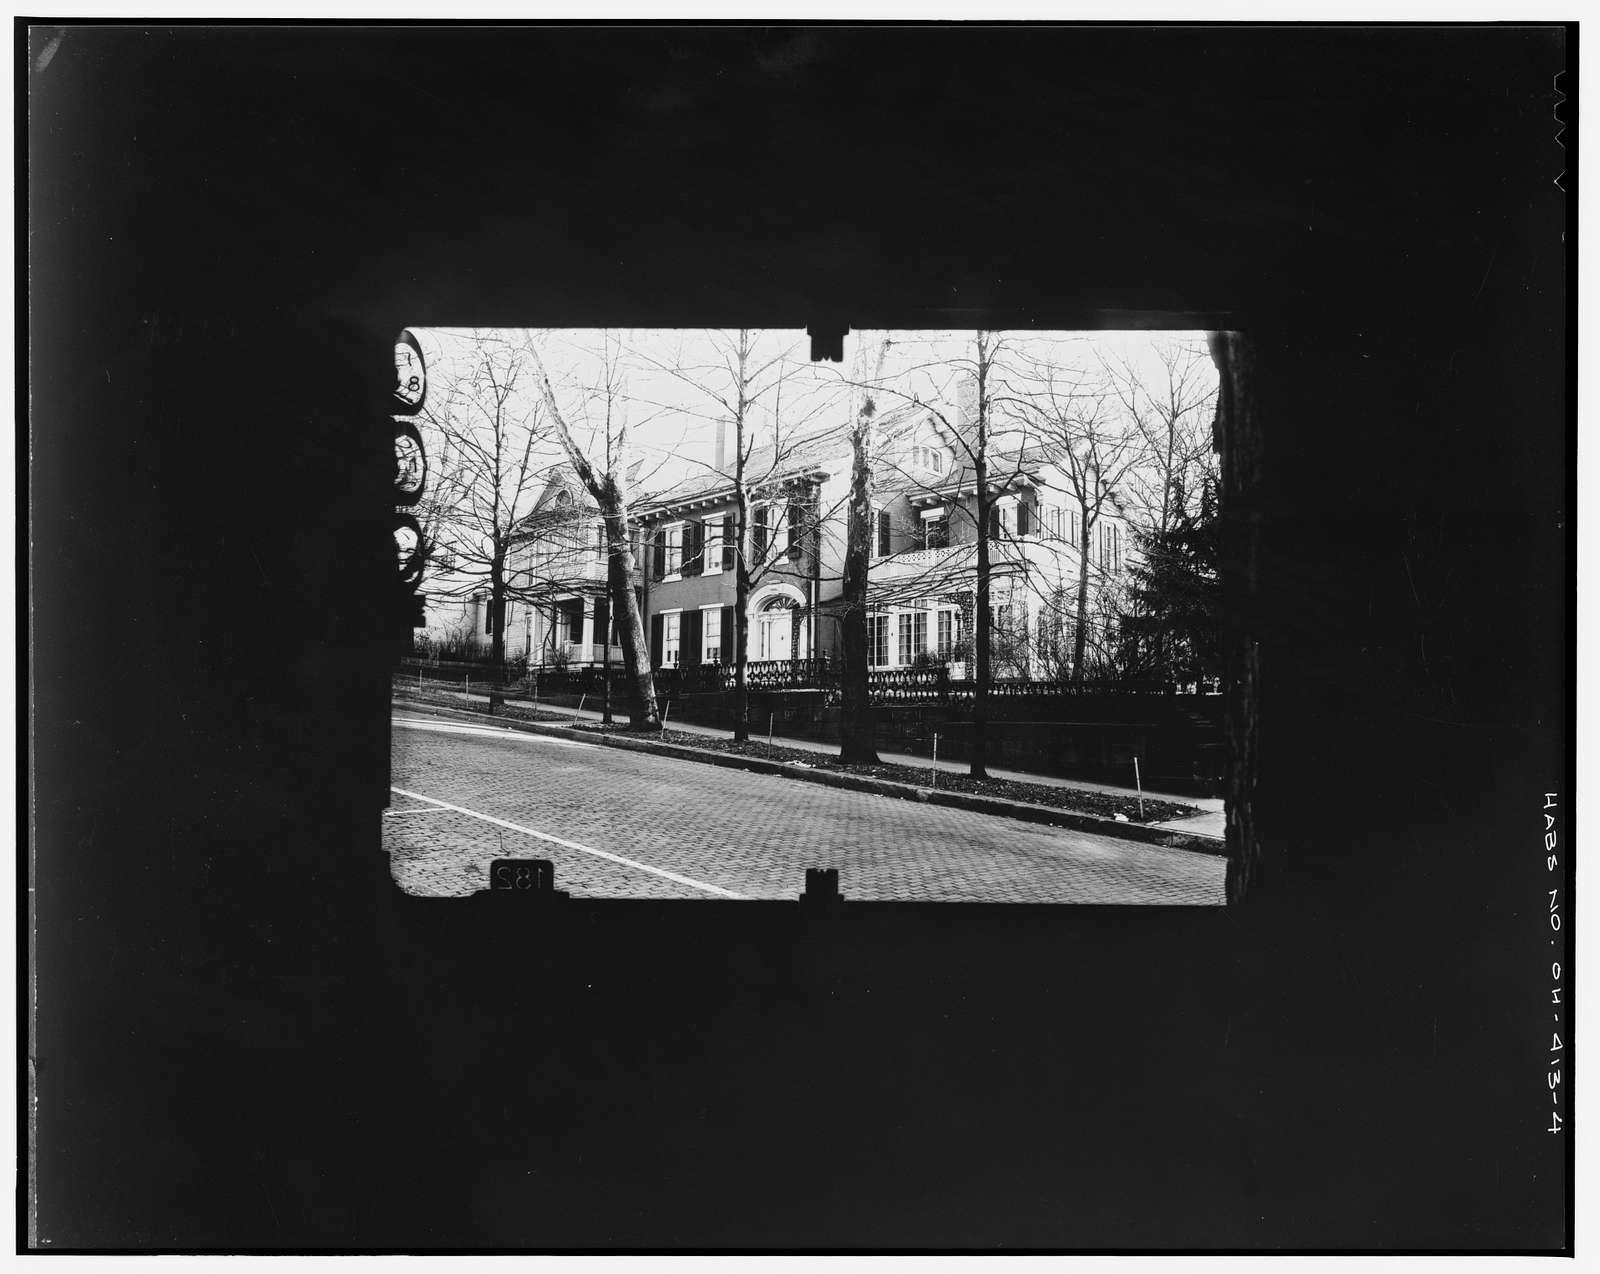 Devol-Dallow House, 118 East Wheeling Street, Lancaster, Fairfield County, OH